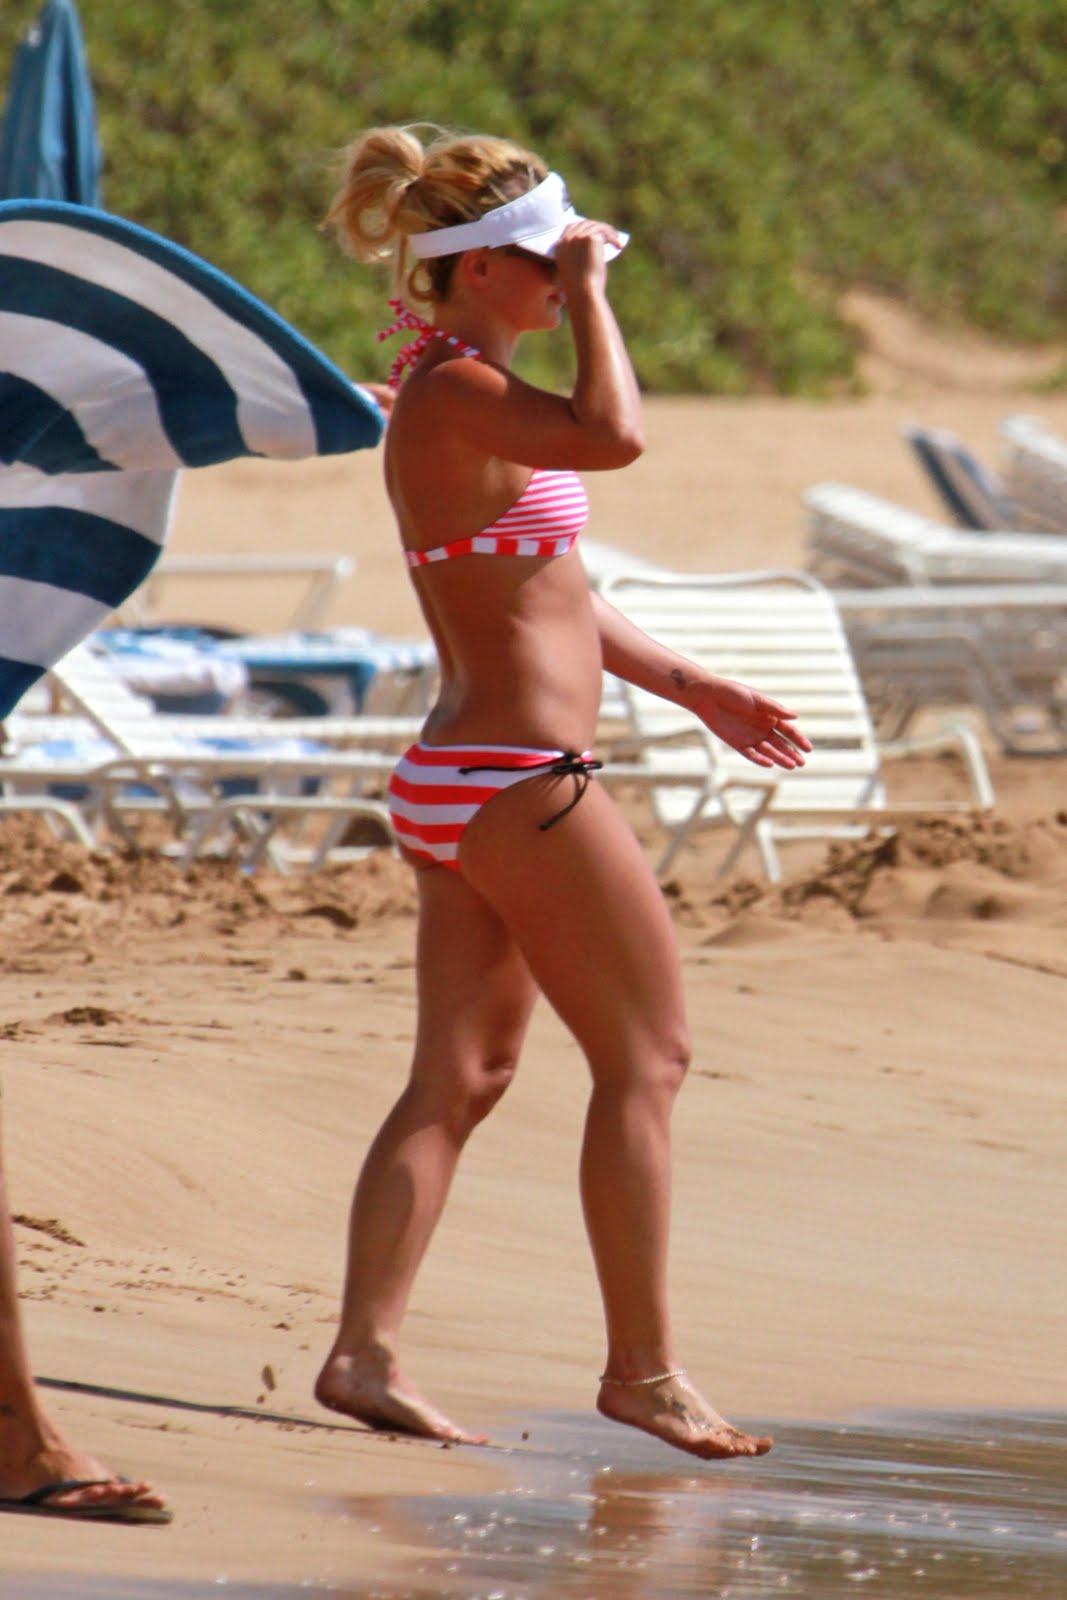 http://1.bp.blogspot.com/_7w745oVy_y0/TIJi-cI7tjI/AAAAAAAAARo/DgvFVxdJ_wI/s1600/BeachPics.jpg